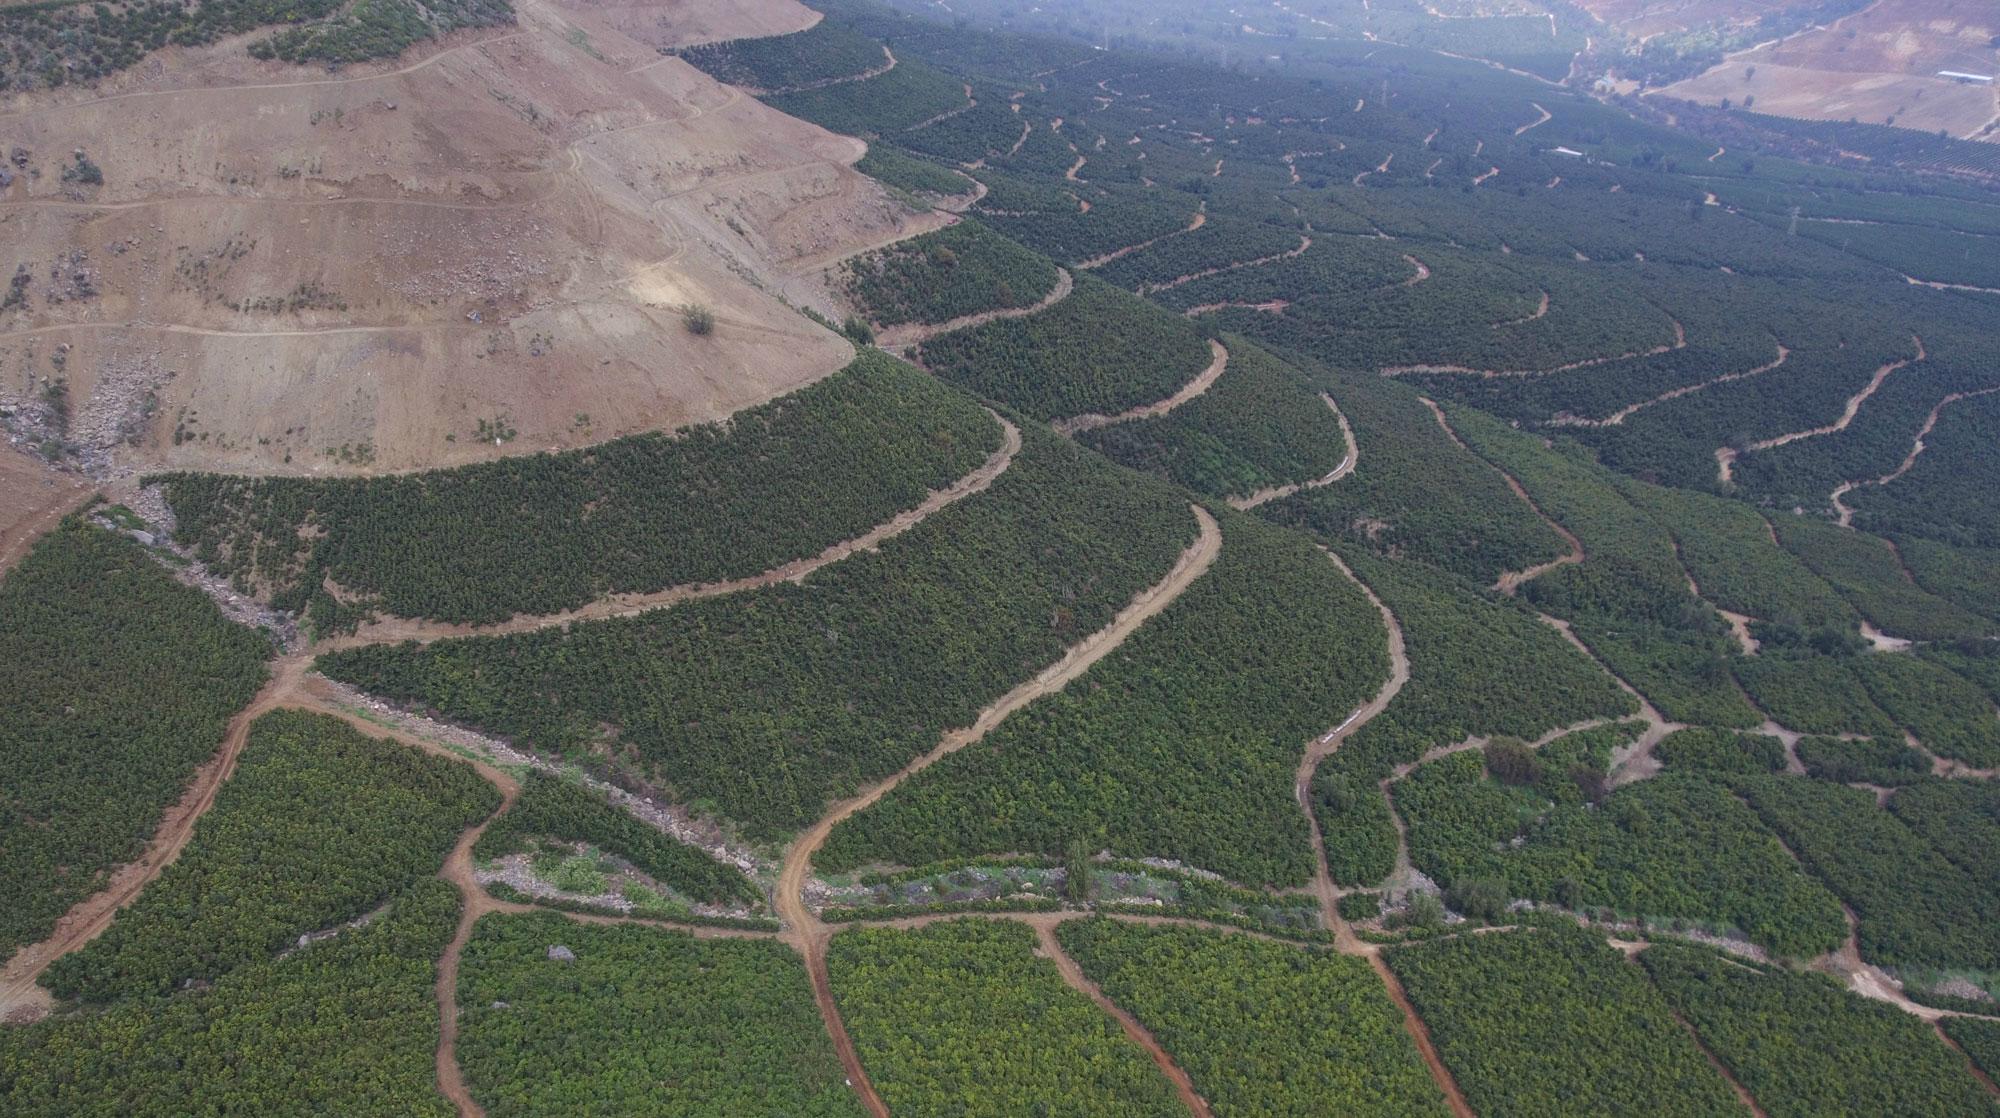 avocado orchard level curves in San Felipe Valley